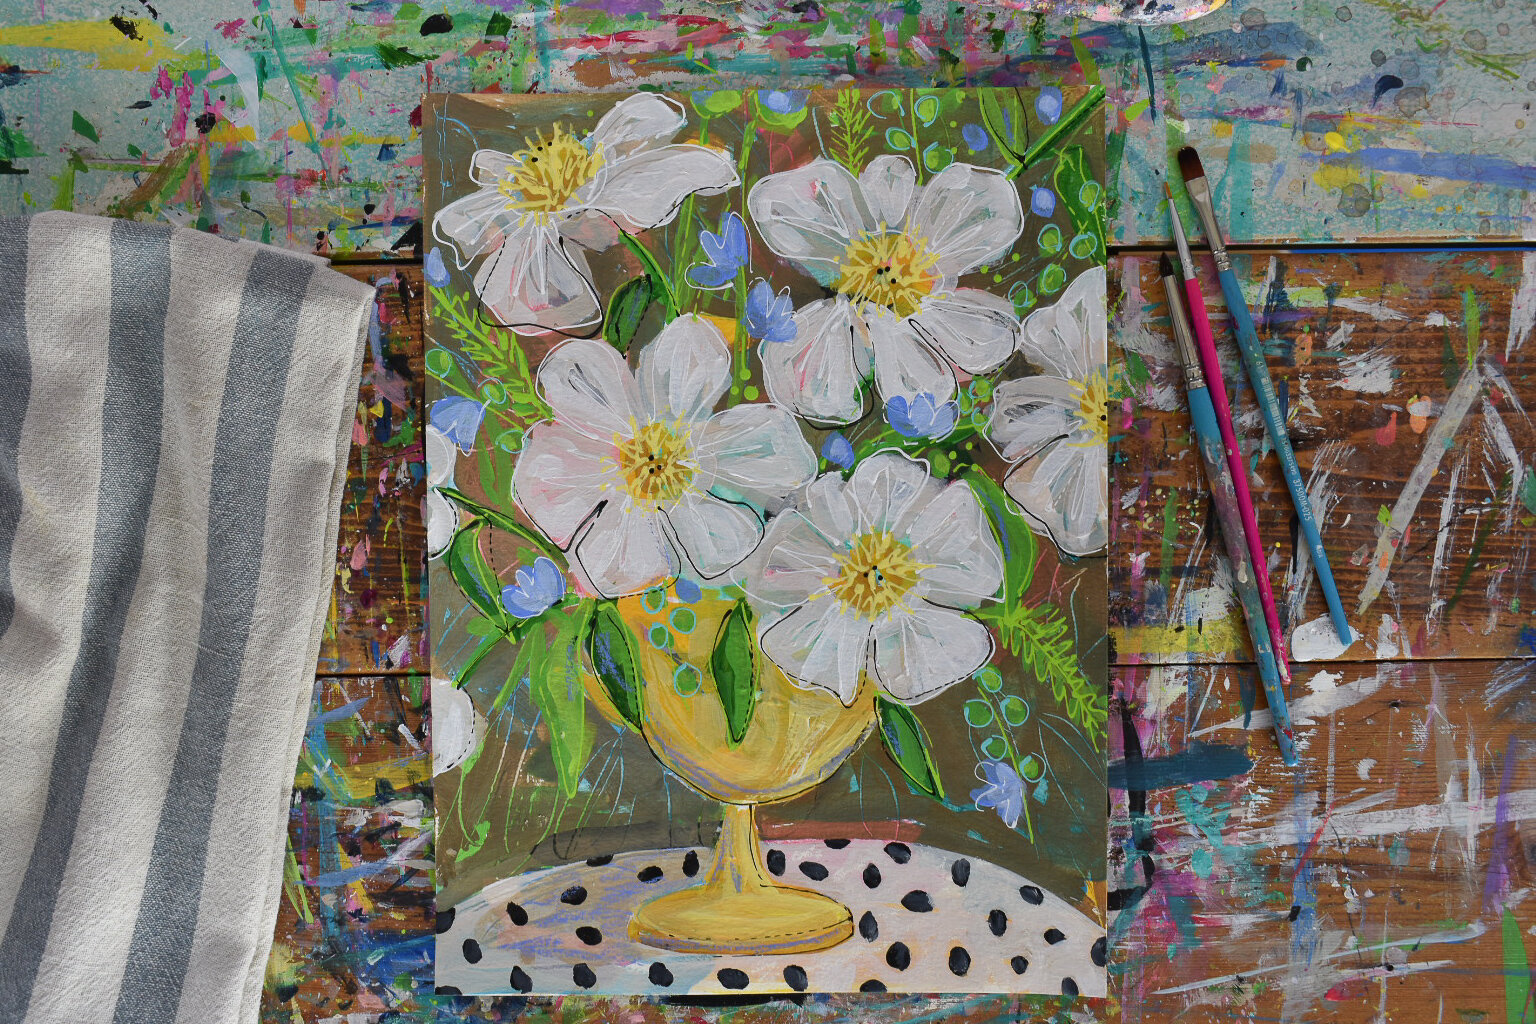 boho_painting_art_poppies_daisyfaithart_4.jpg